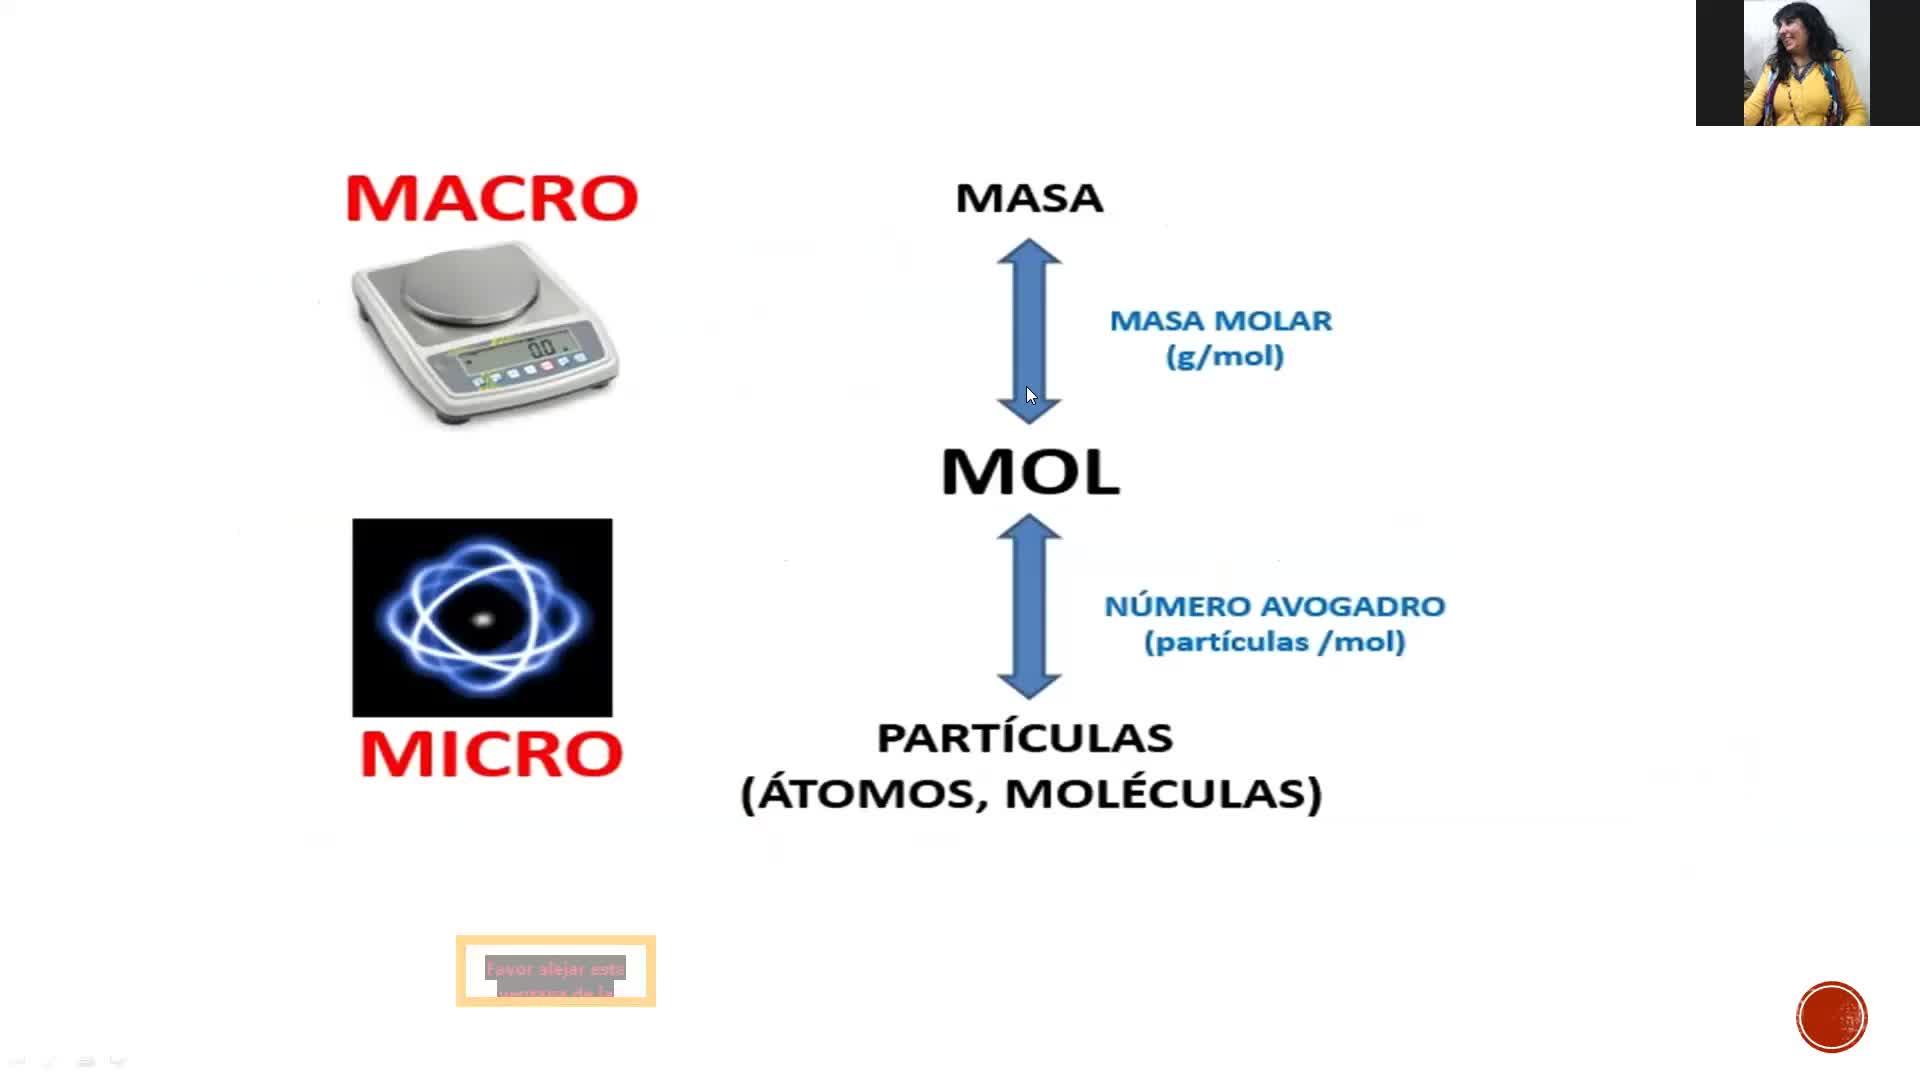 Nro Avogadro - mol - Estequiometria Clase 04-06-21